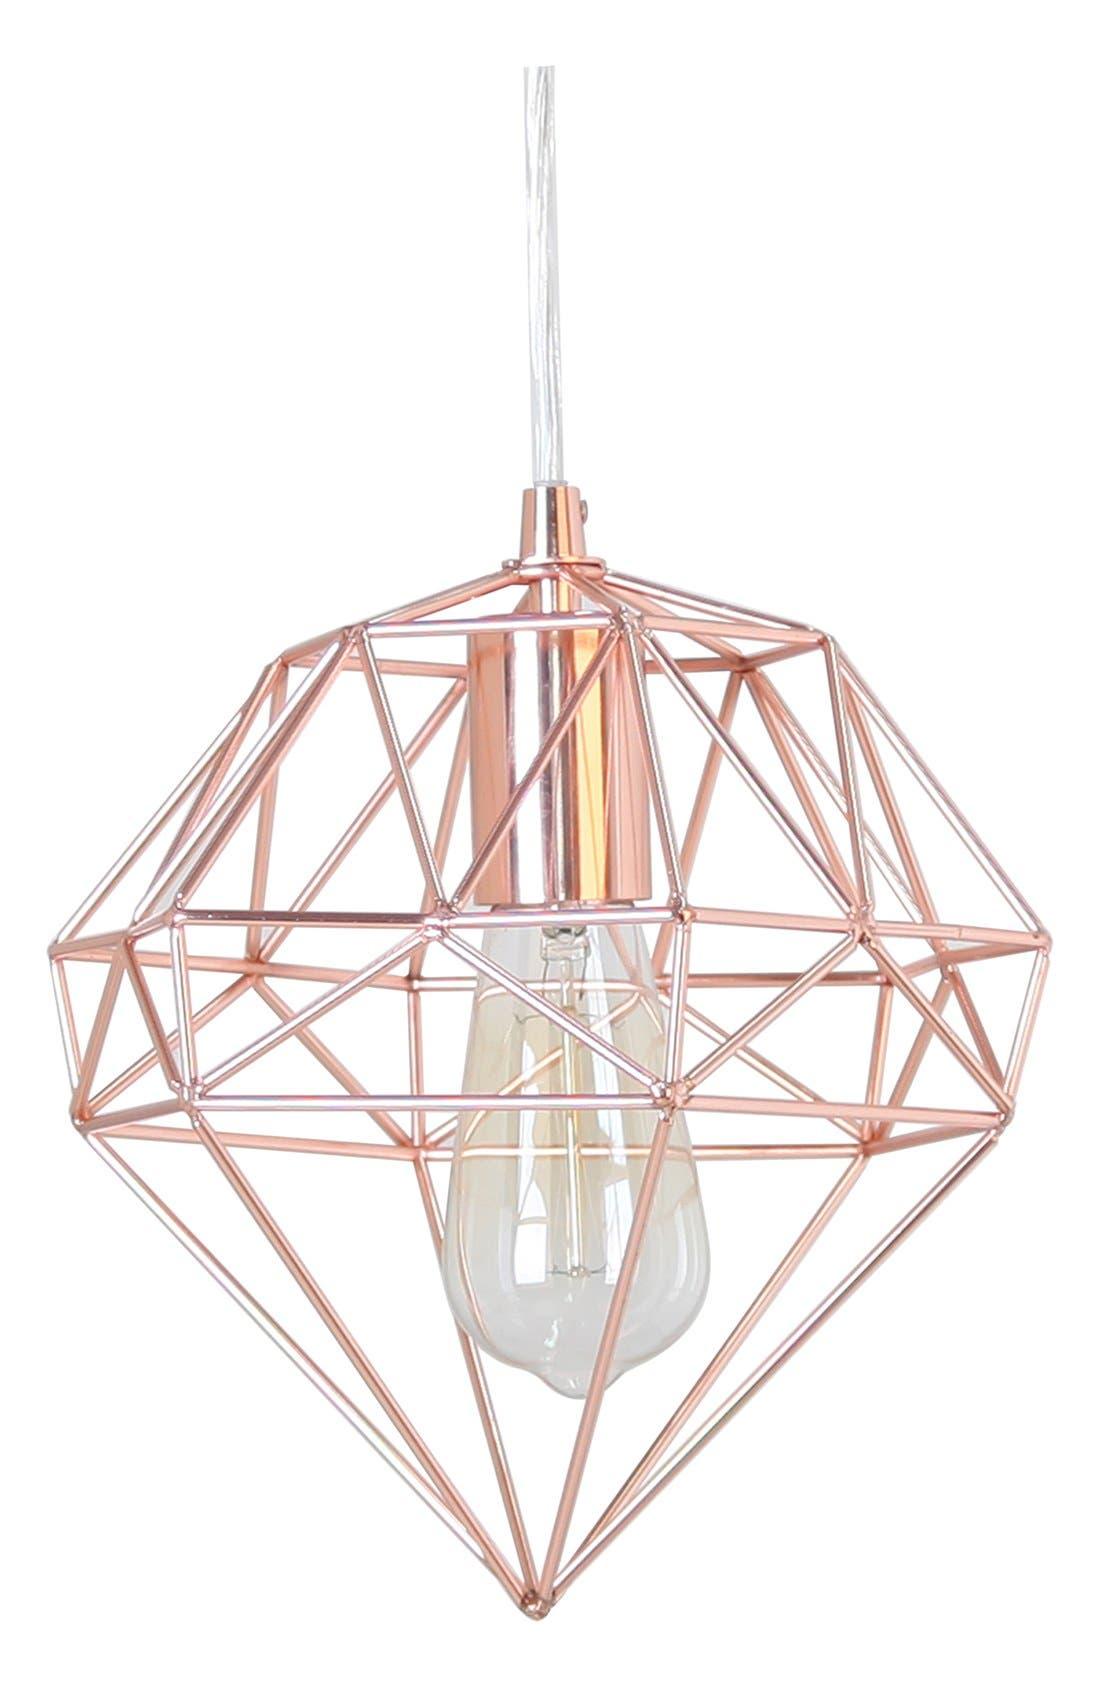 Crystal Art Gallery Metallic Hanging Lamp